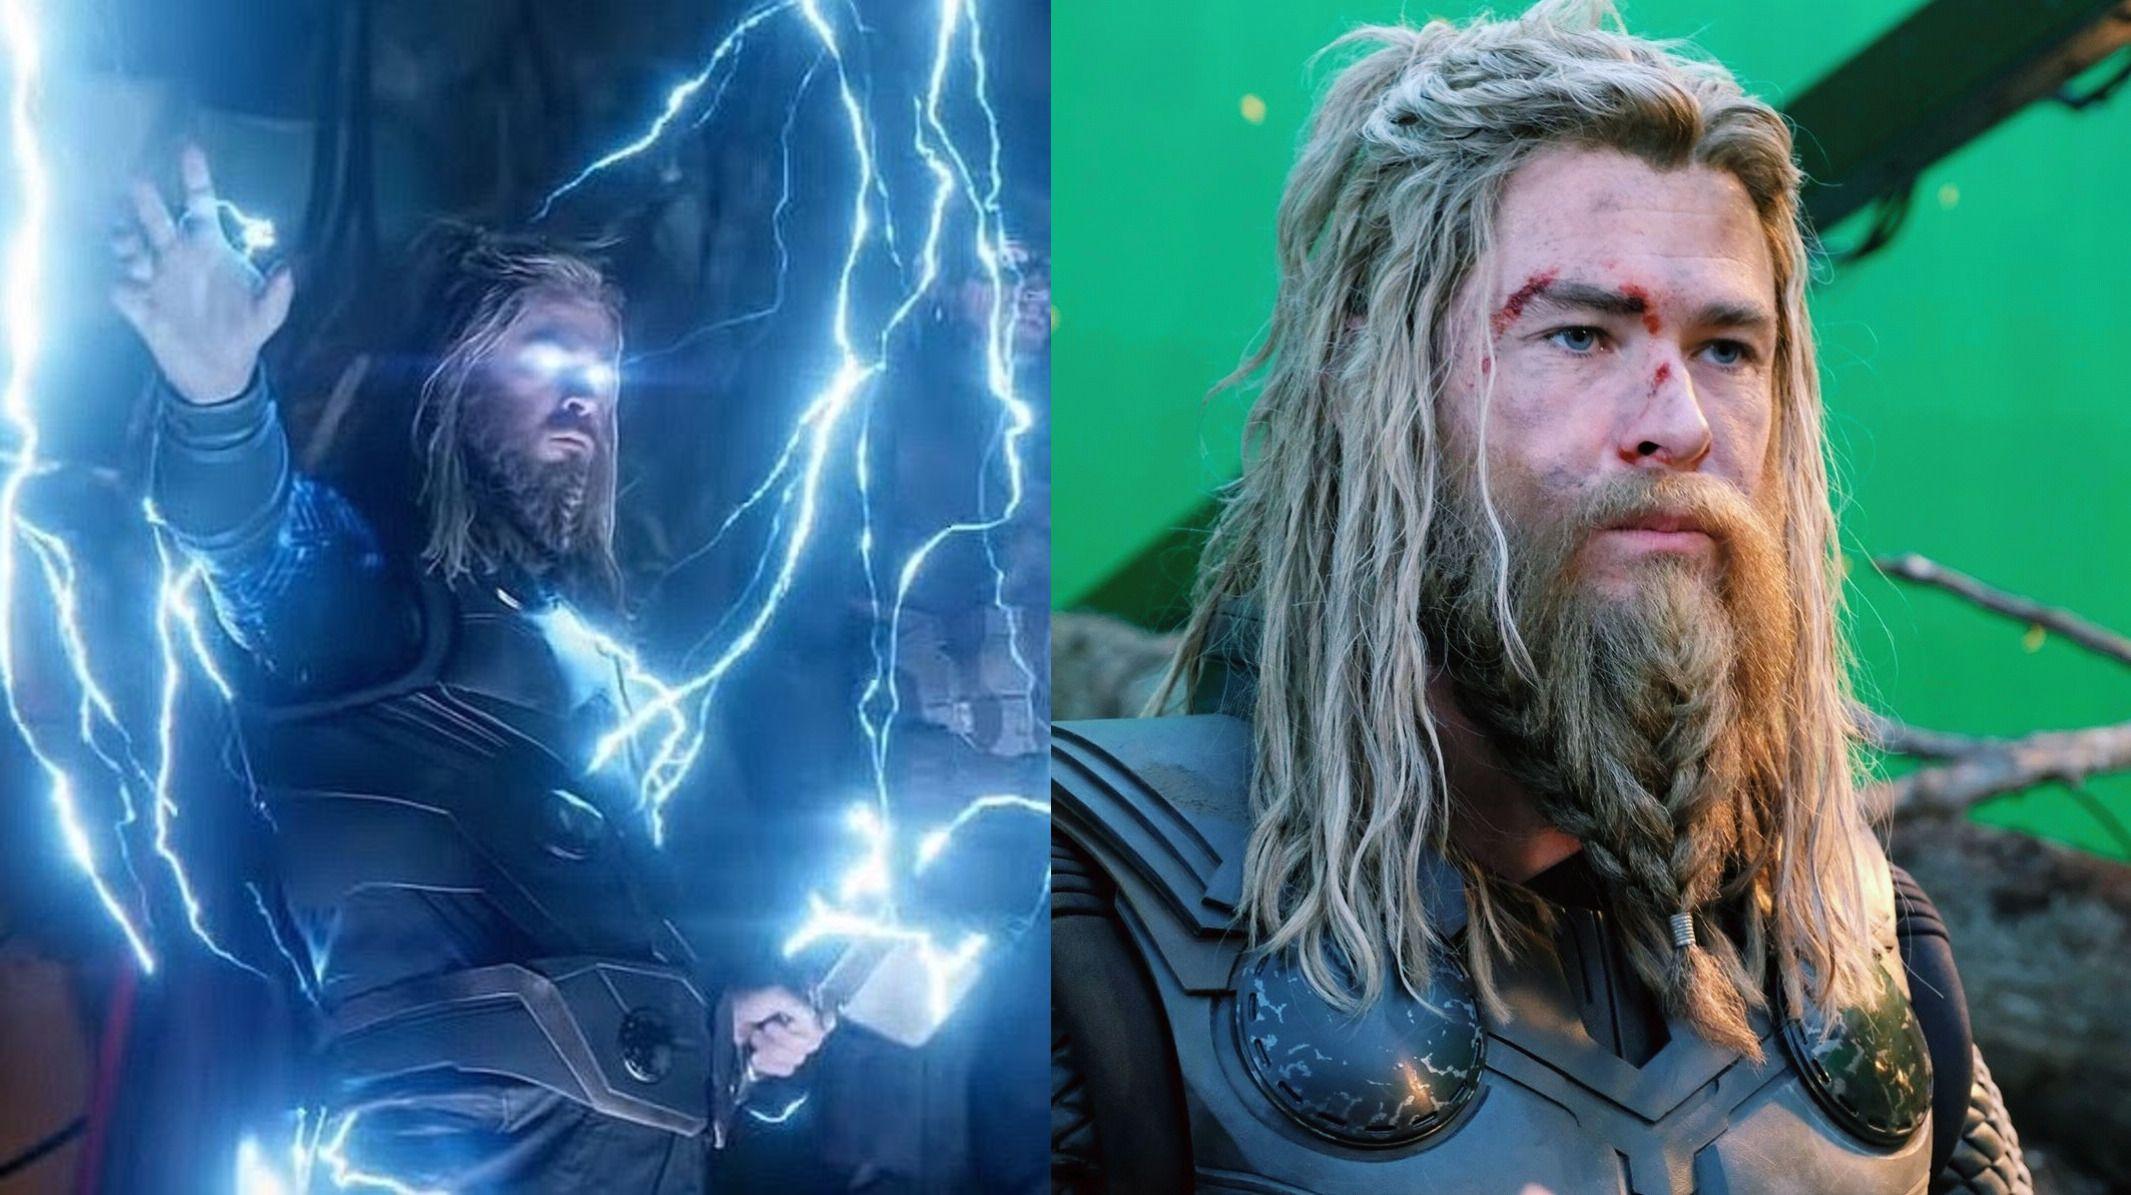 Chris Hemsworth Aka Thor In Avengers Endgame Looking Like A